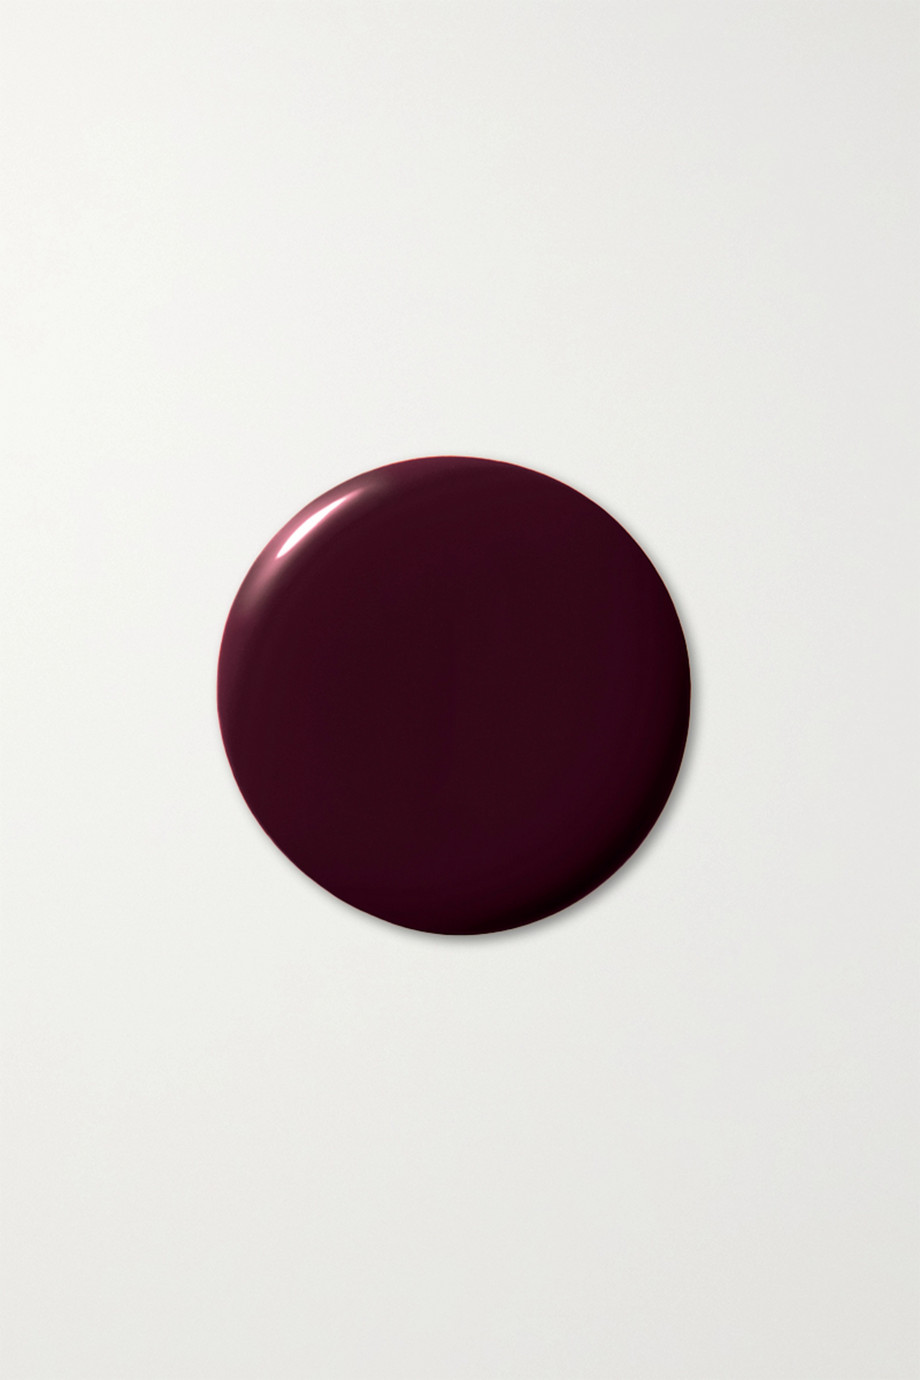 Christian Louboutin Beauty Nail Color - Sevillana